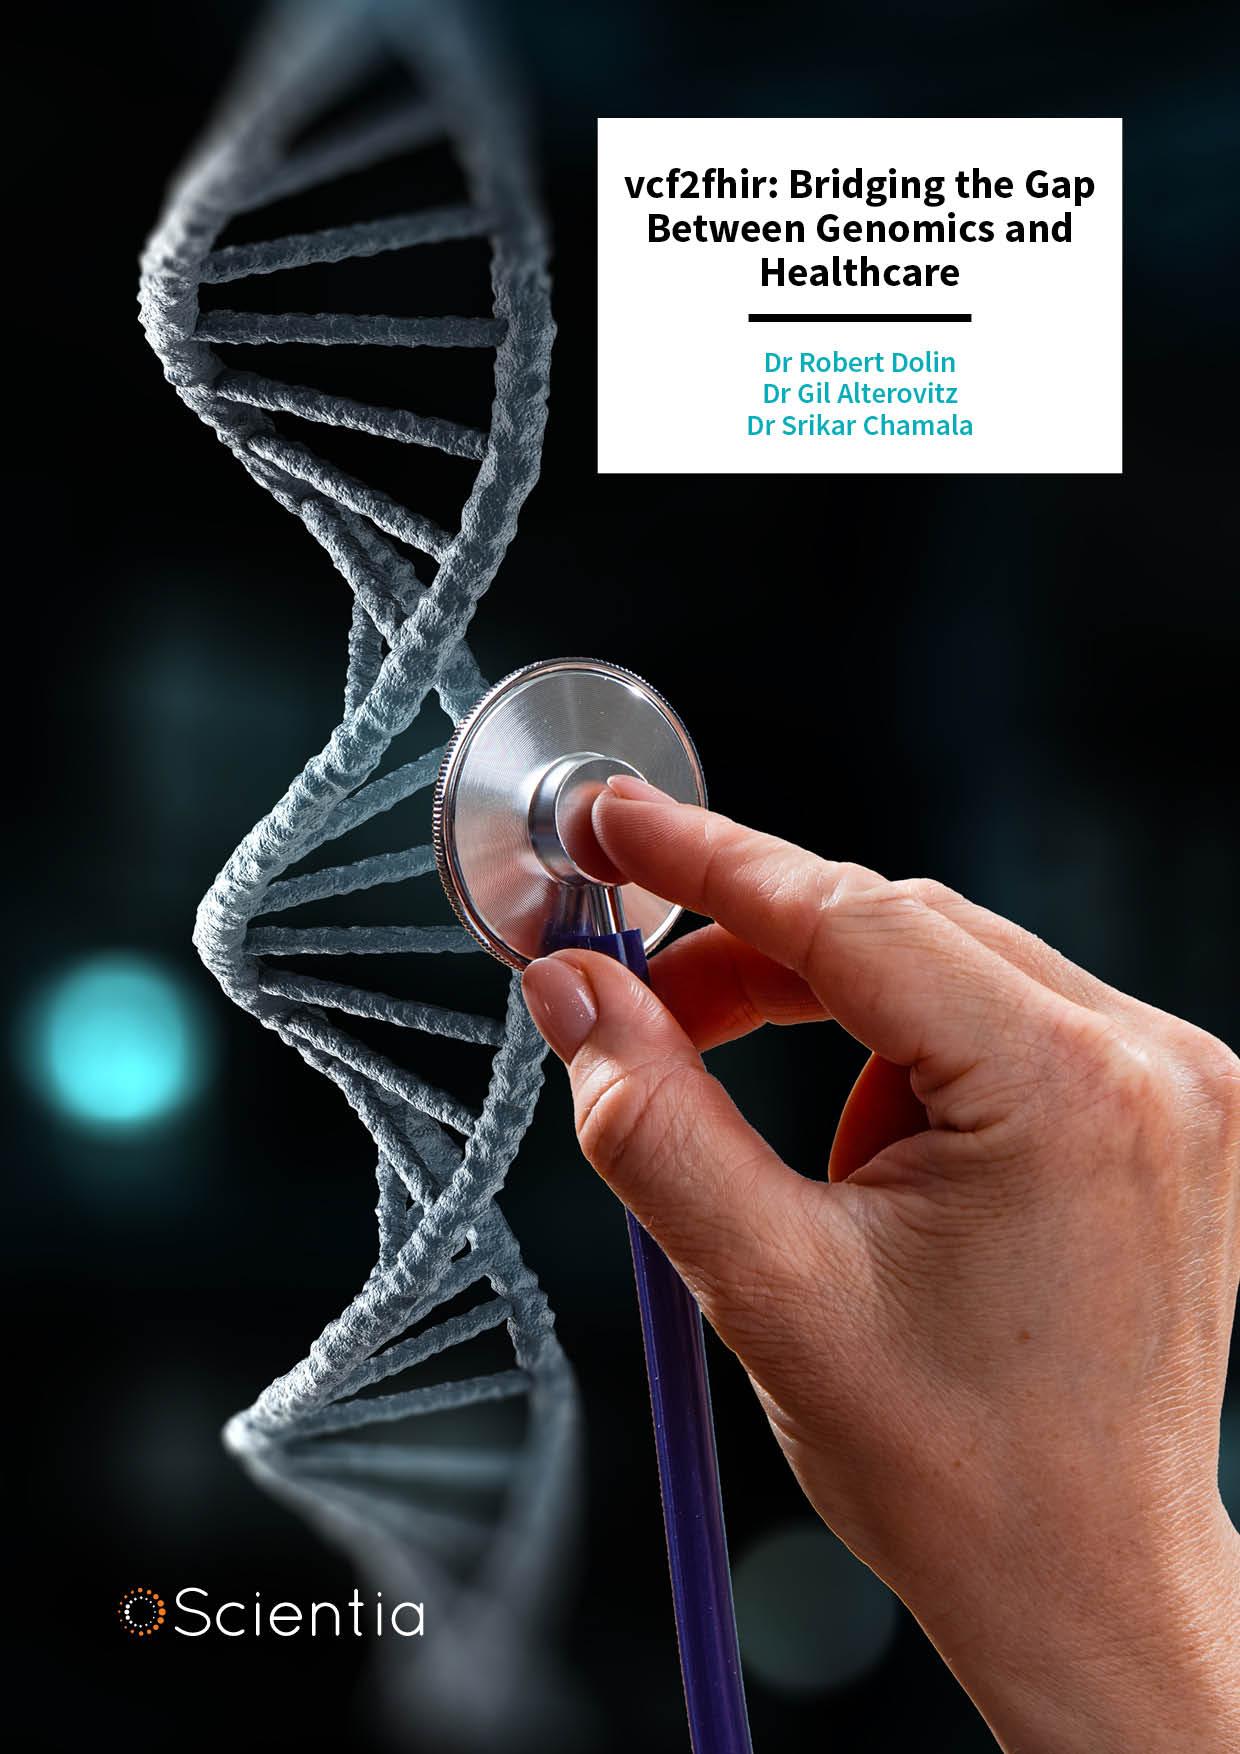 Dr Robert Dolin | Dr Srikar Chamala | Dr Gil Alterovitz – vcf2fhir: Bridging the Gap Between Genomics and Healthcare